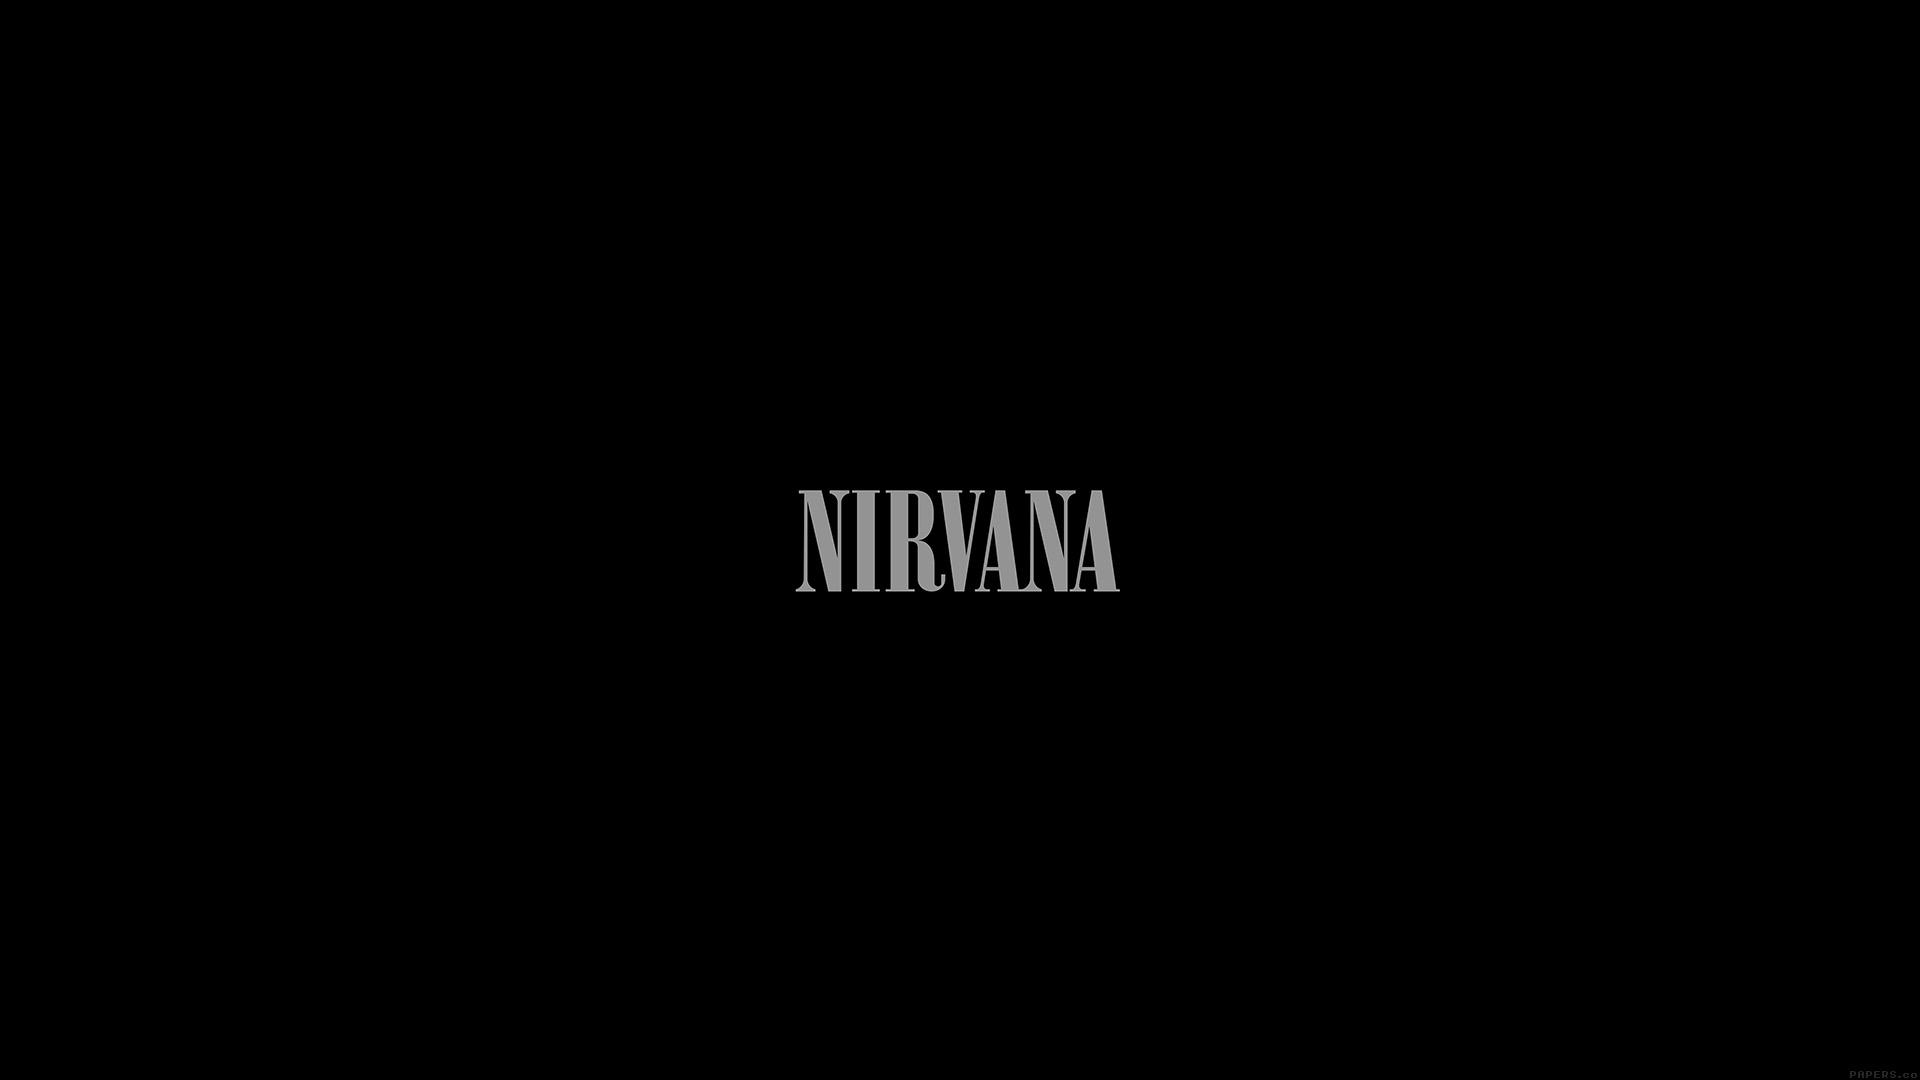 Fall Wallpaper Minimalist Ak78 Nirvana Dark Logo Simple Minimal Music Wallpaper